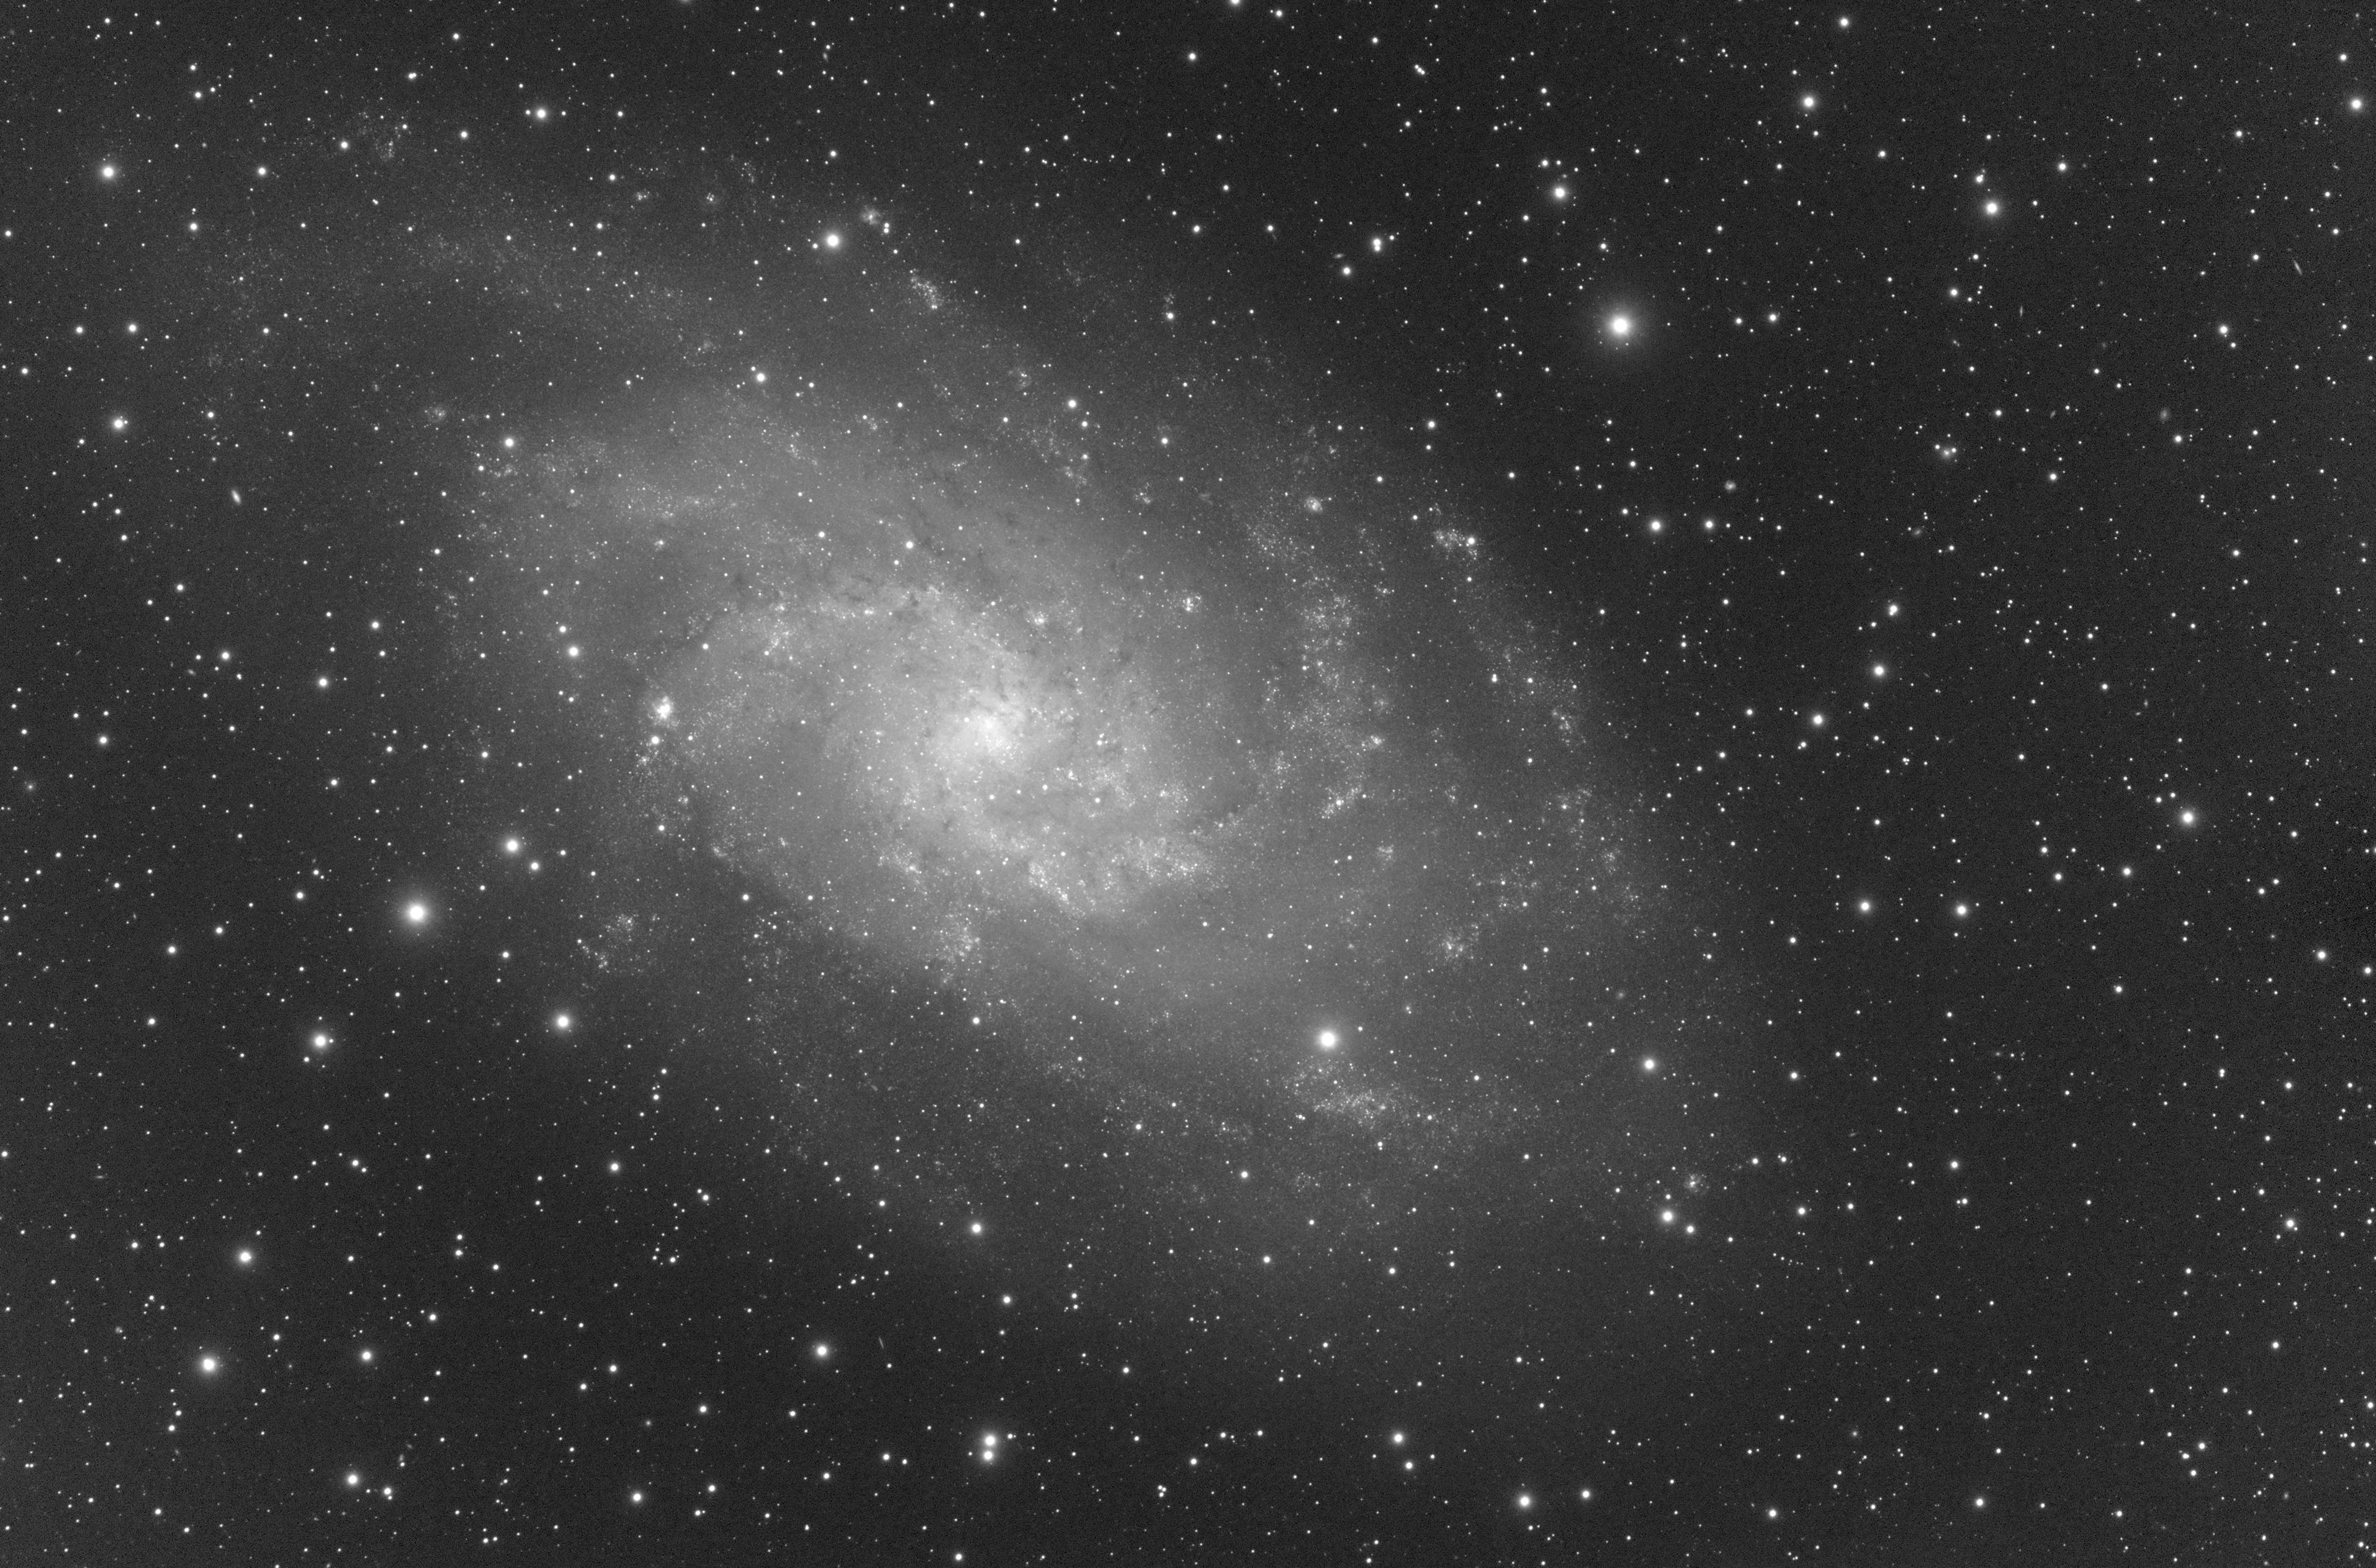 M33-26x180s-L-G111.jpg